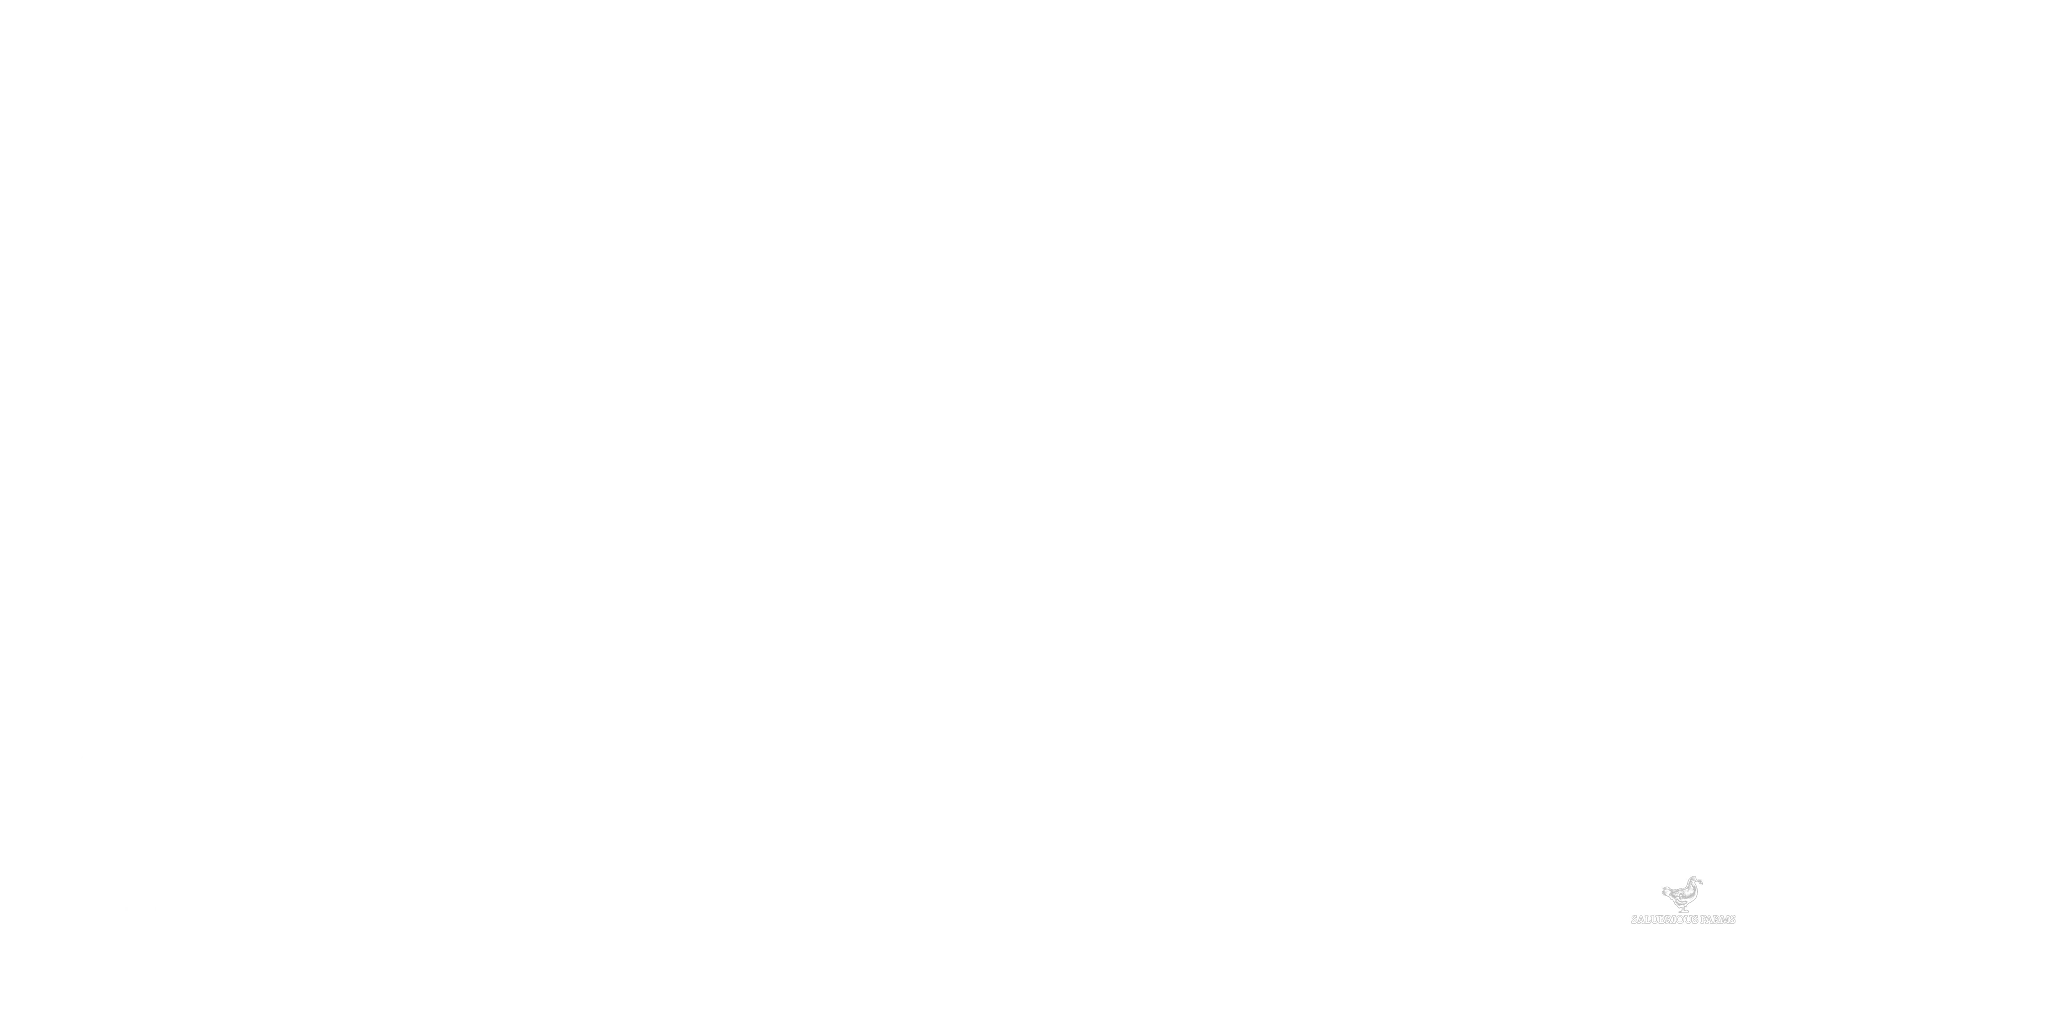 11th Annual AMBC Fall Festival